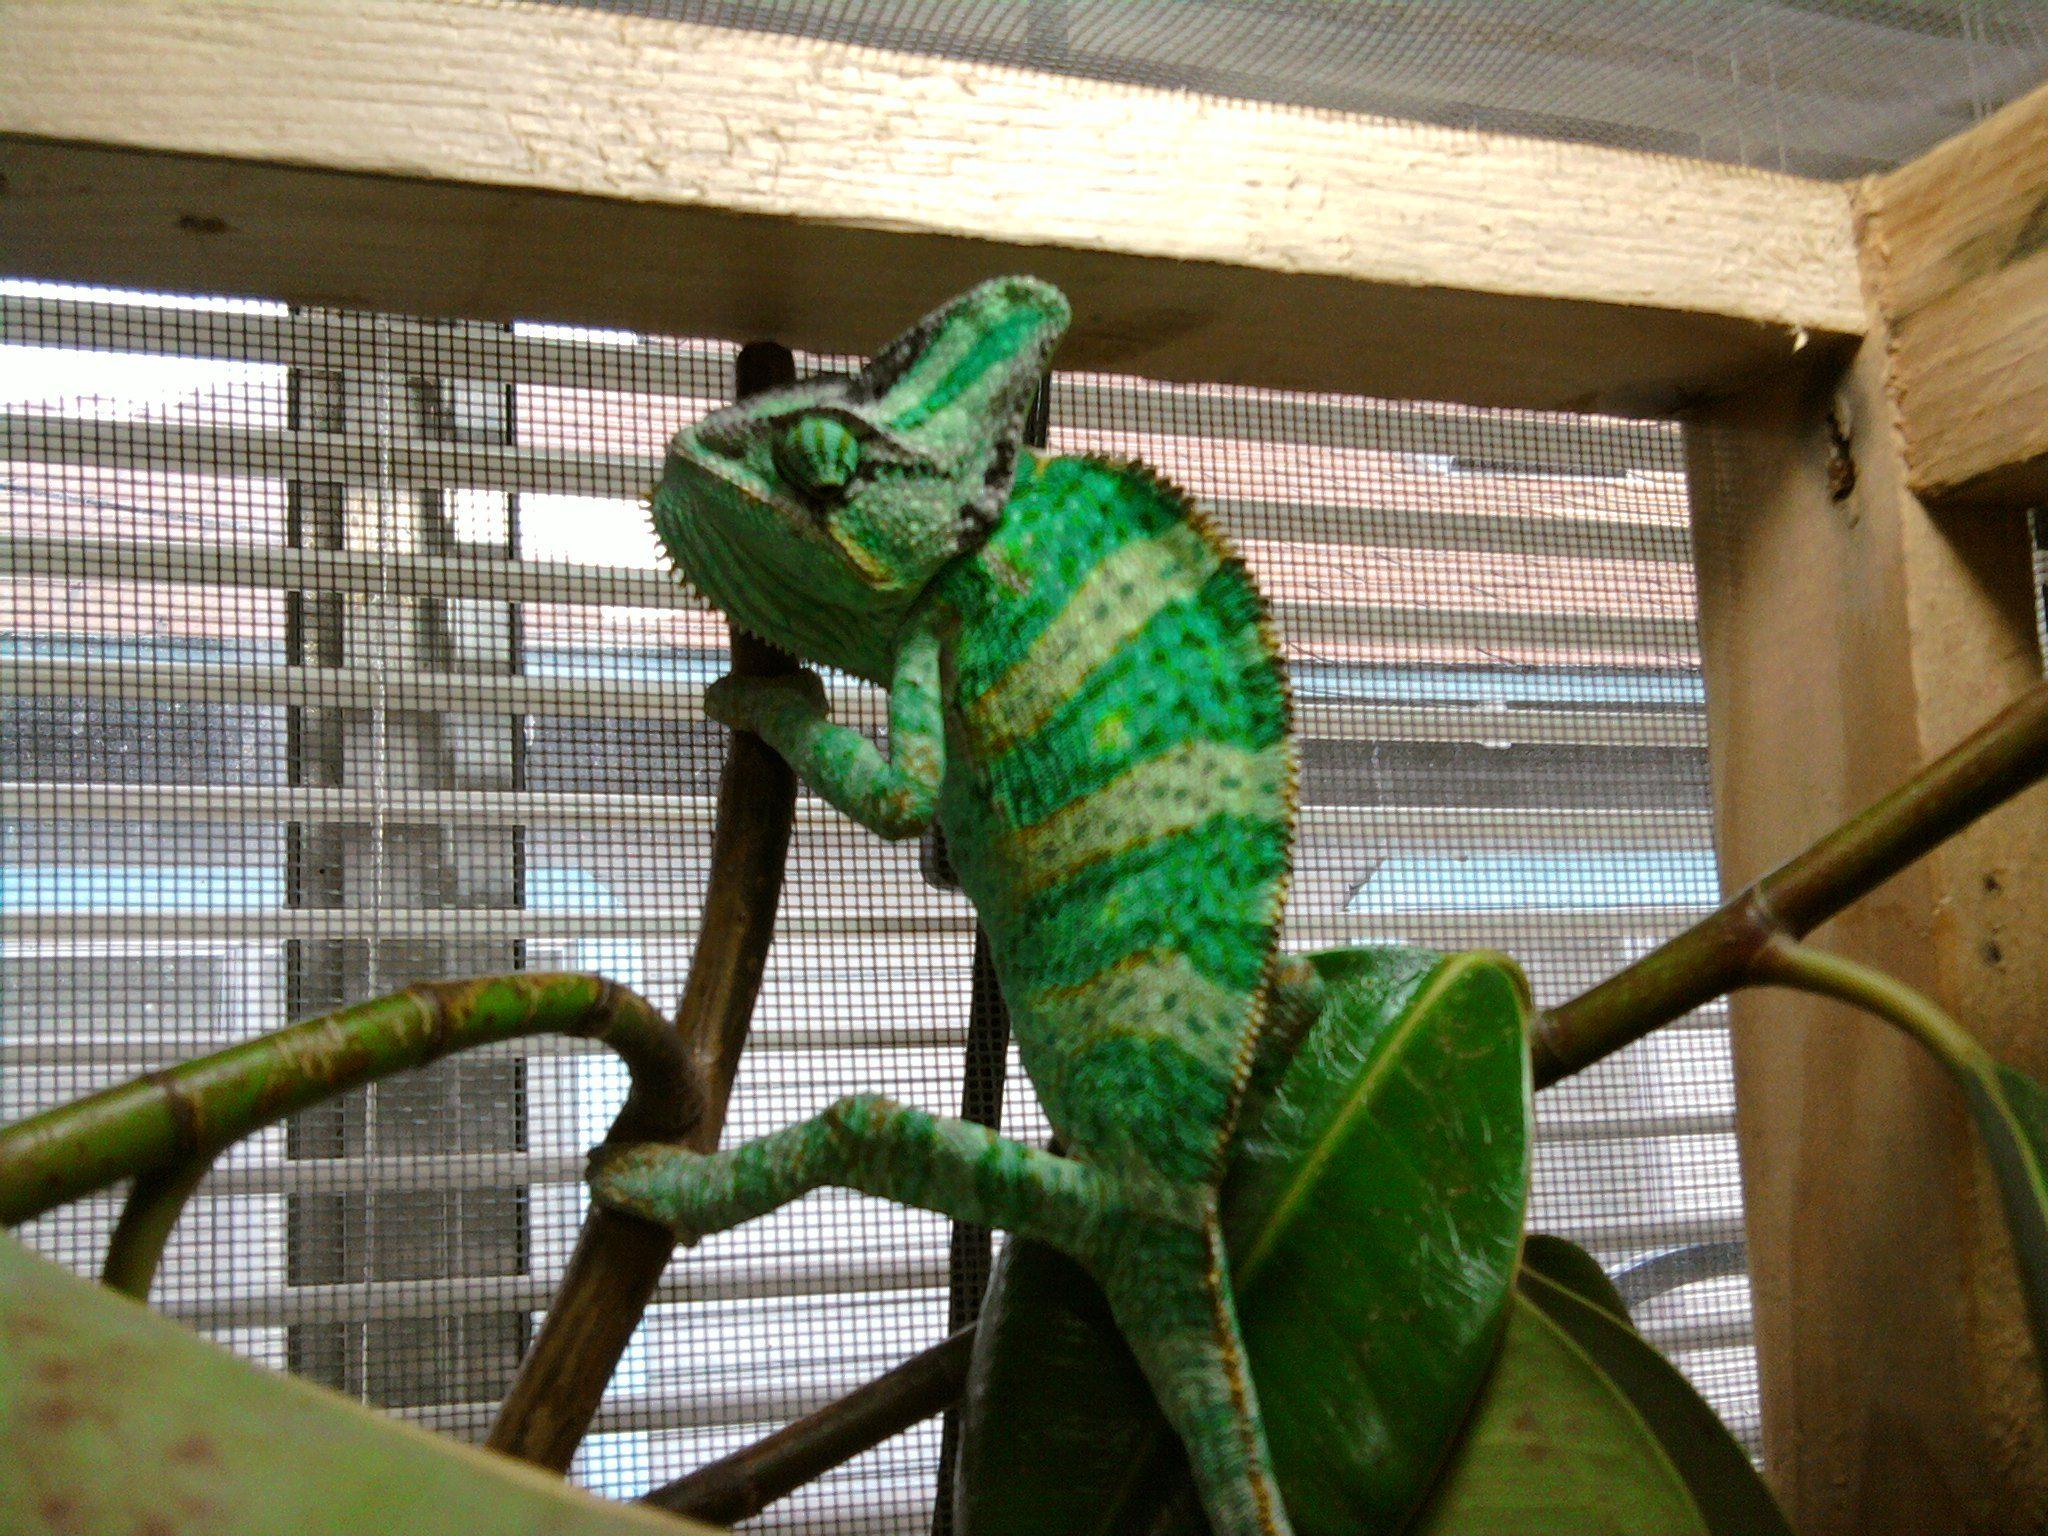 25 amazing chameleon pictures - My Pet Veiled Chameleon